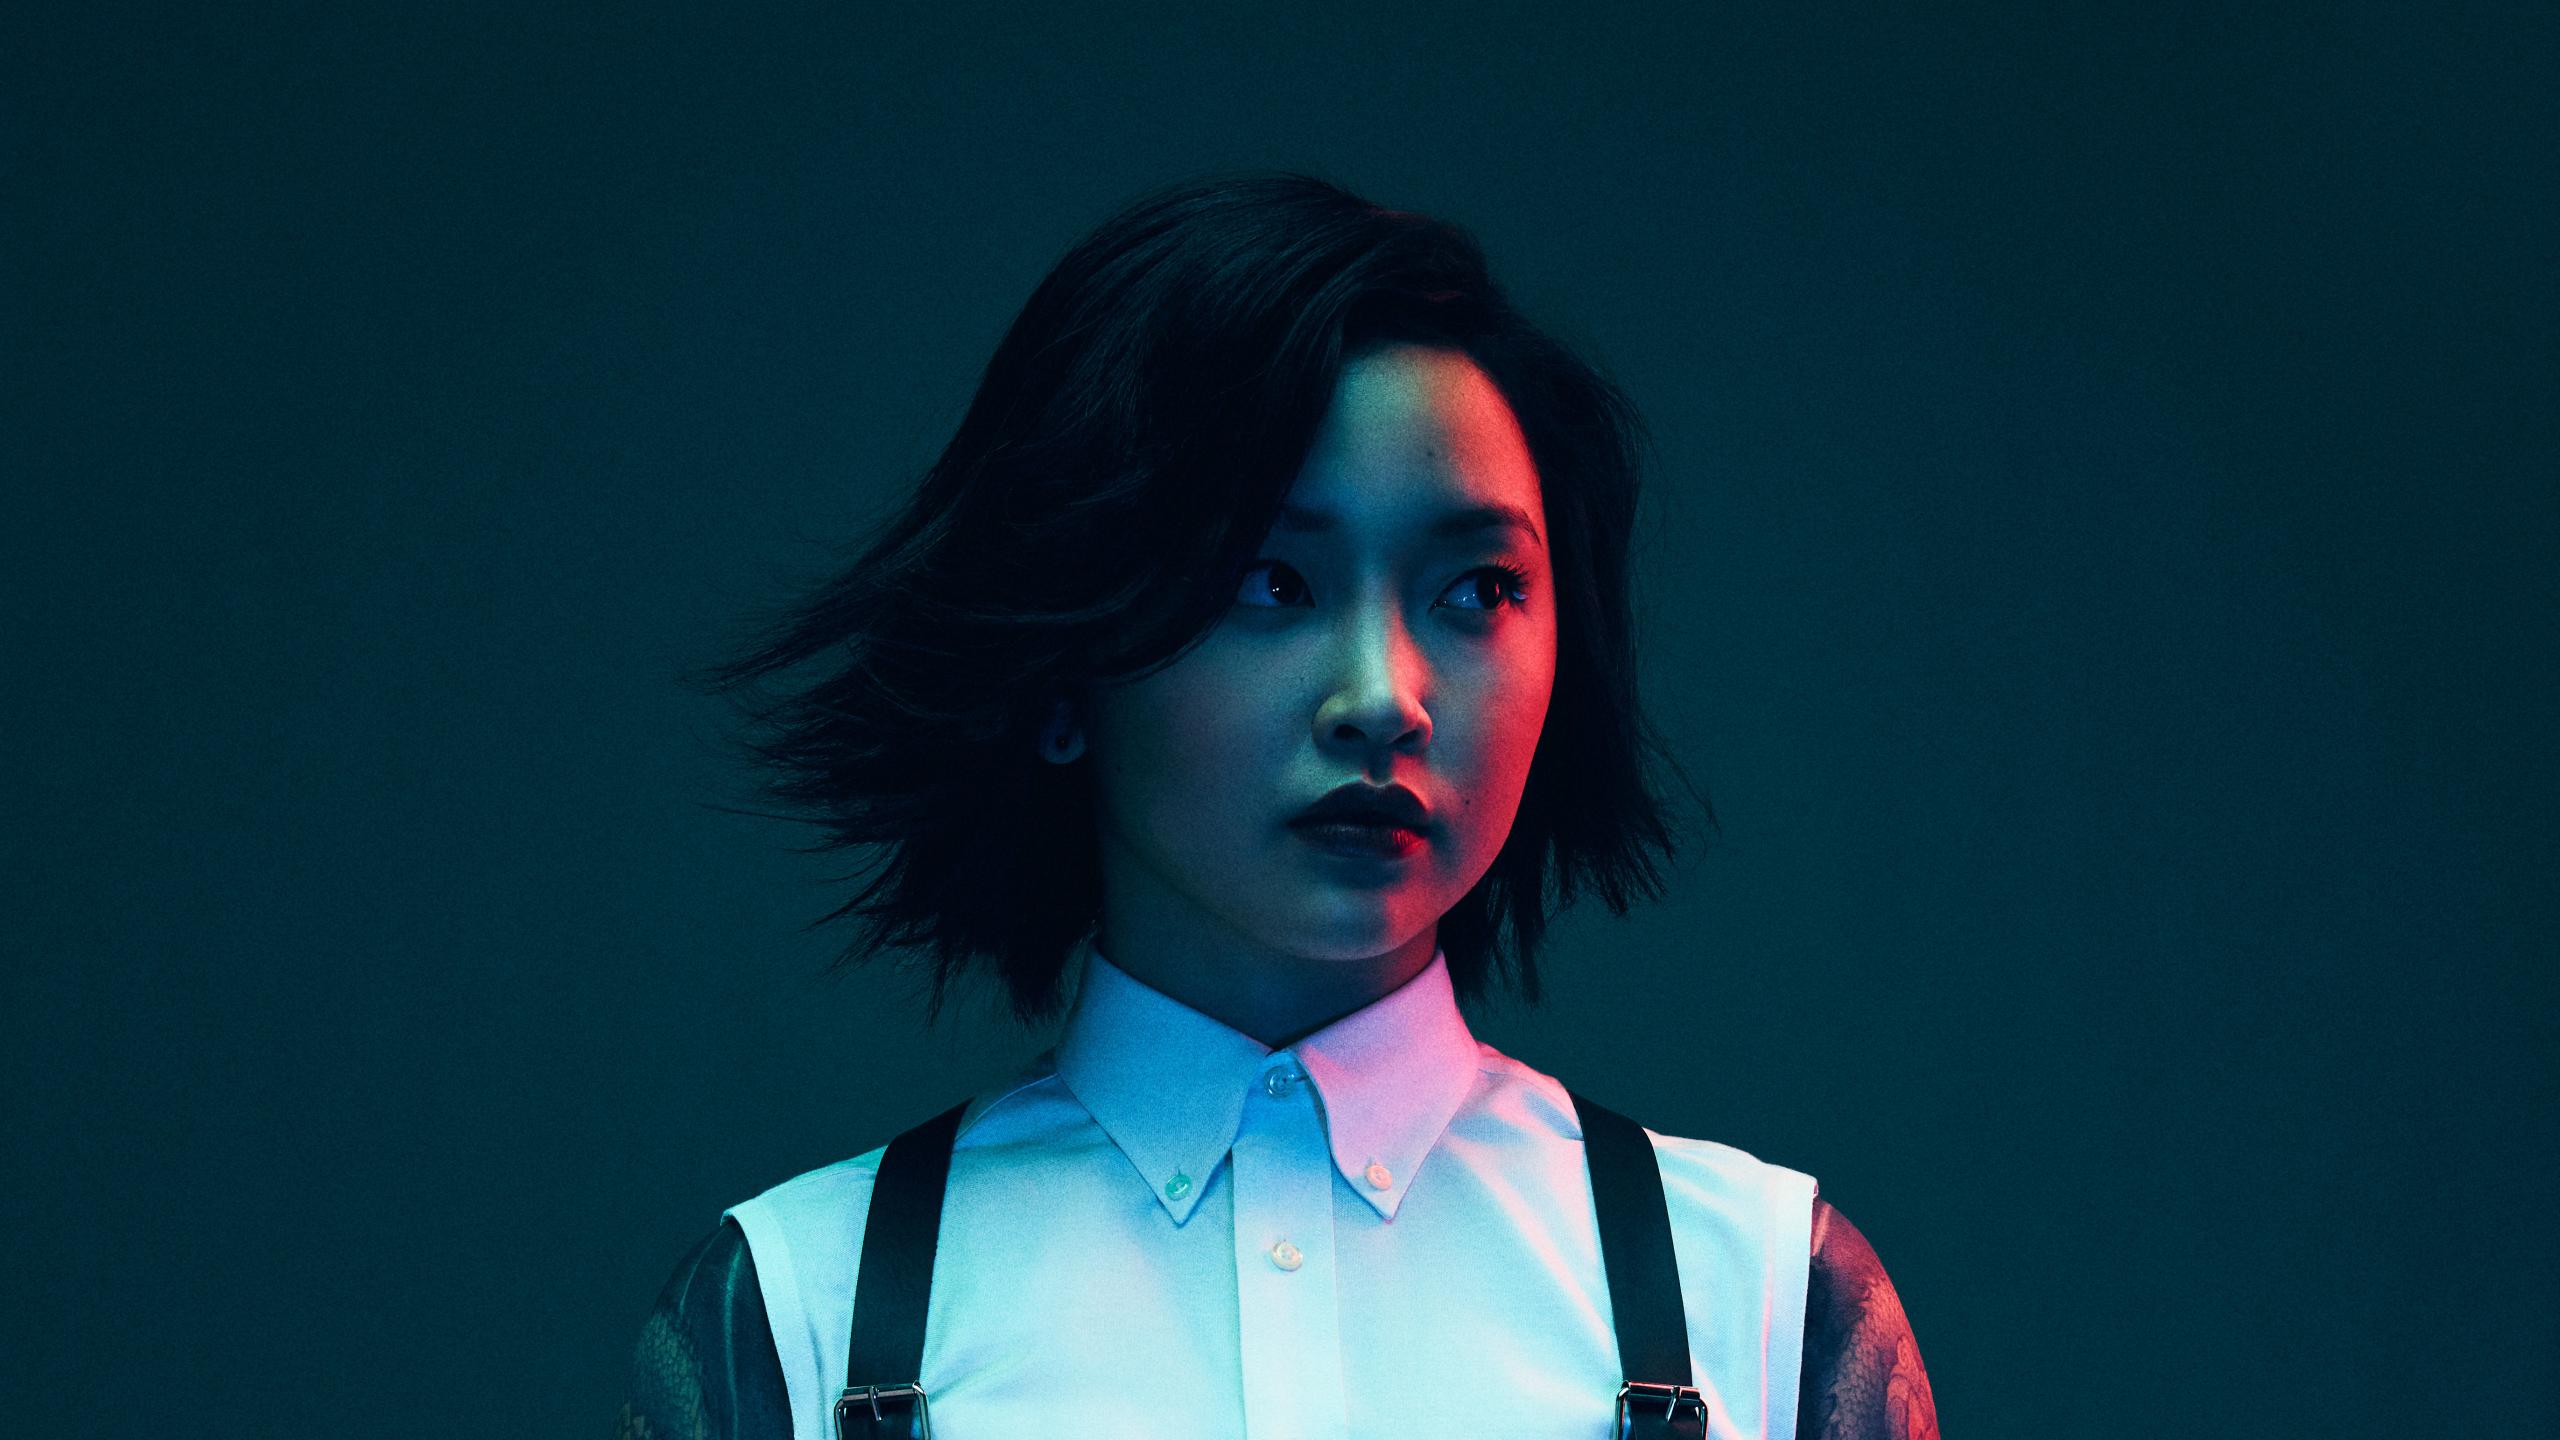 'Boo, Bitch' Netflix Series Release Date Starring Lana Condor